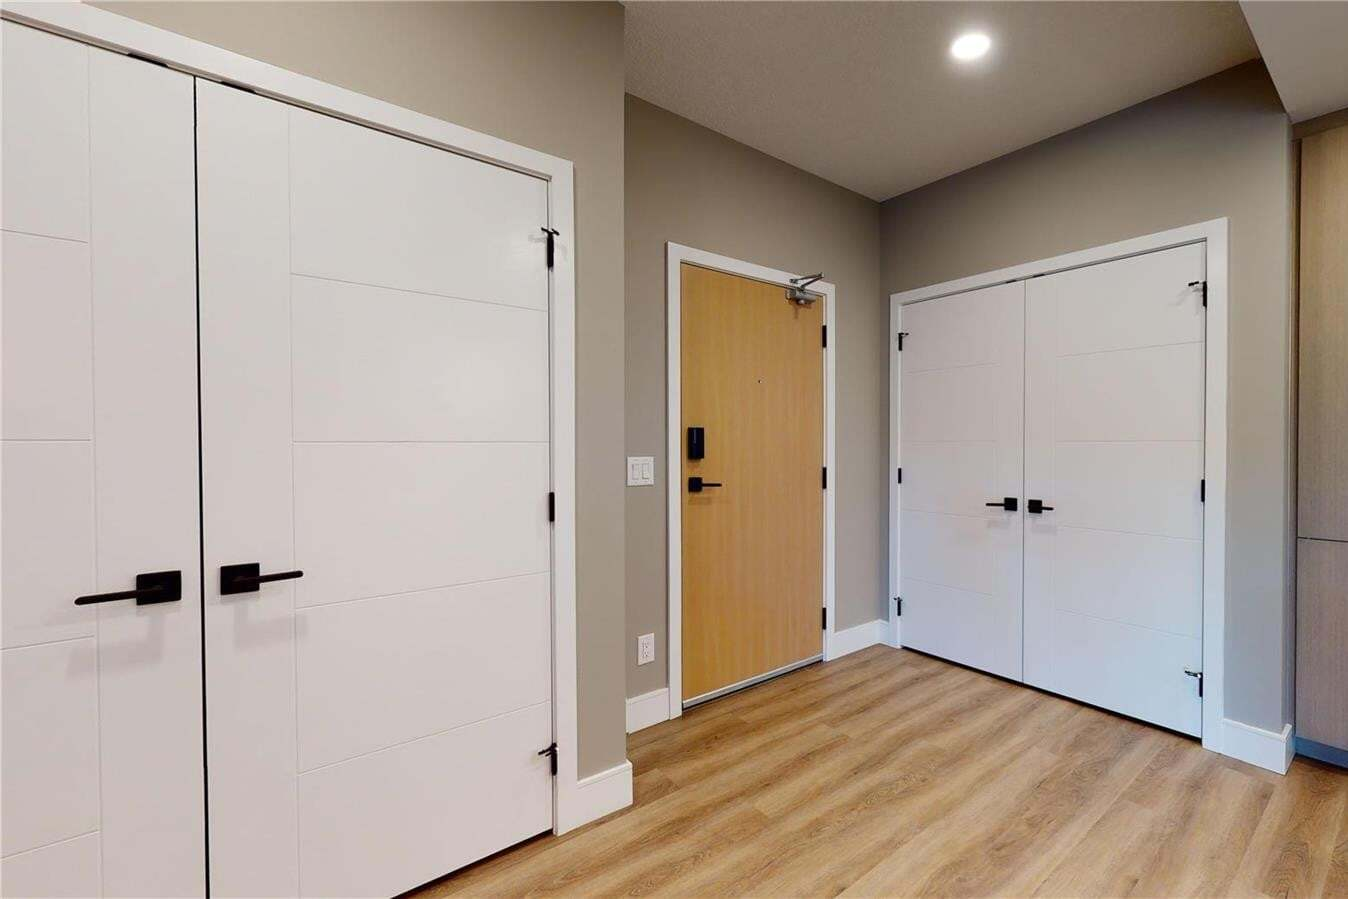 Condo for sale at 529 Truswell Rd Kelowna British Columbia - MLS: 10191663